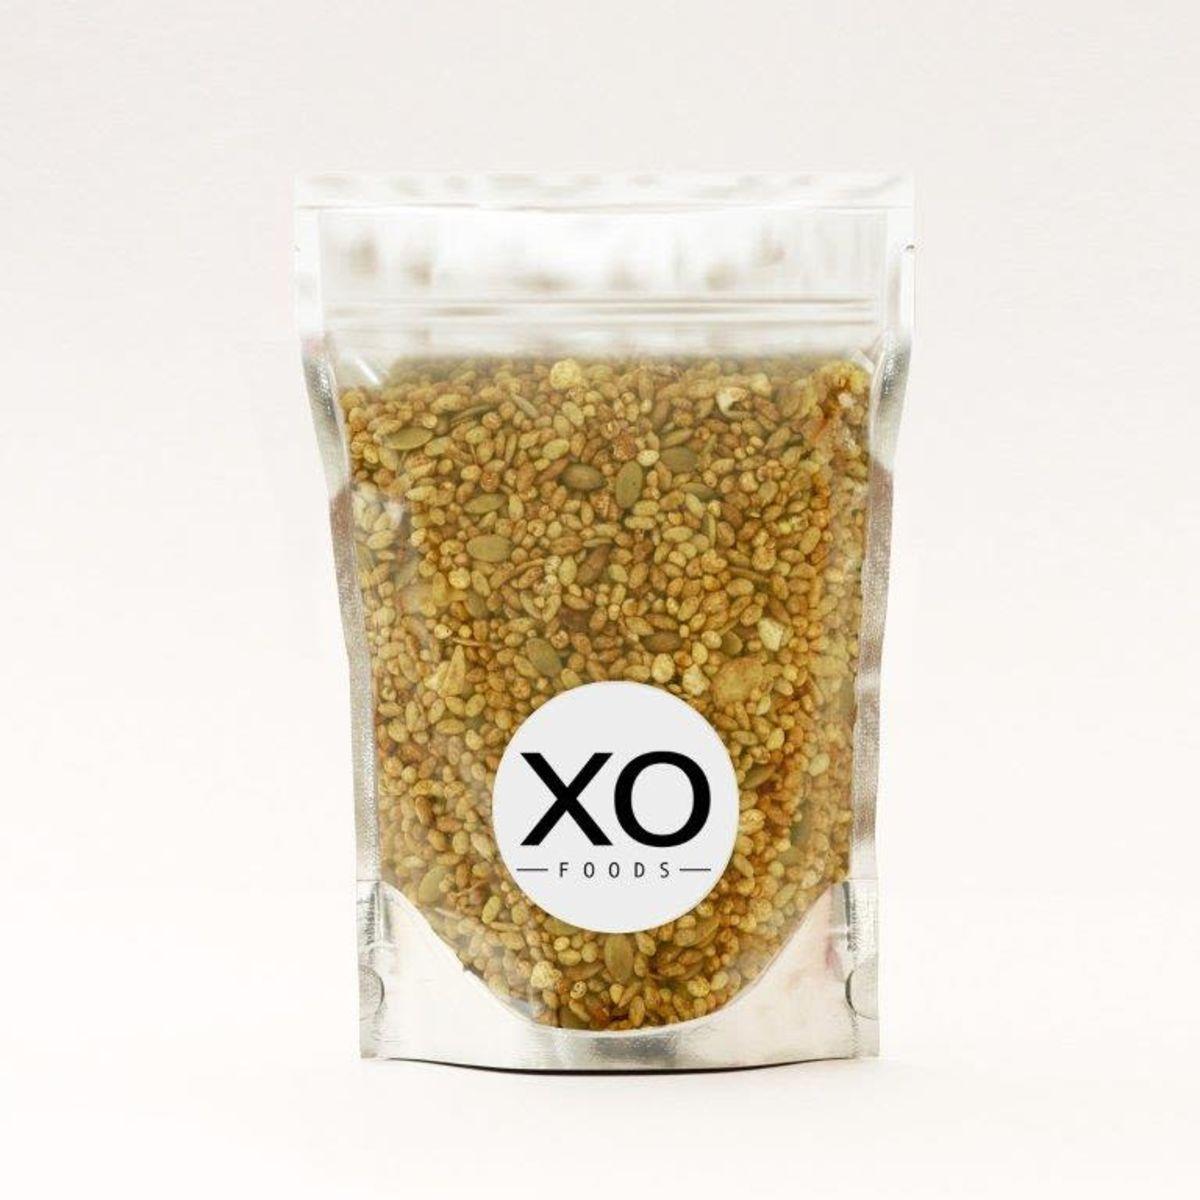 XO Foods - Gluten Free Golden Moozly